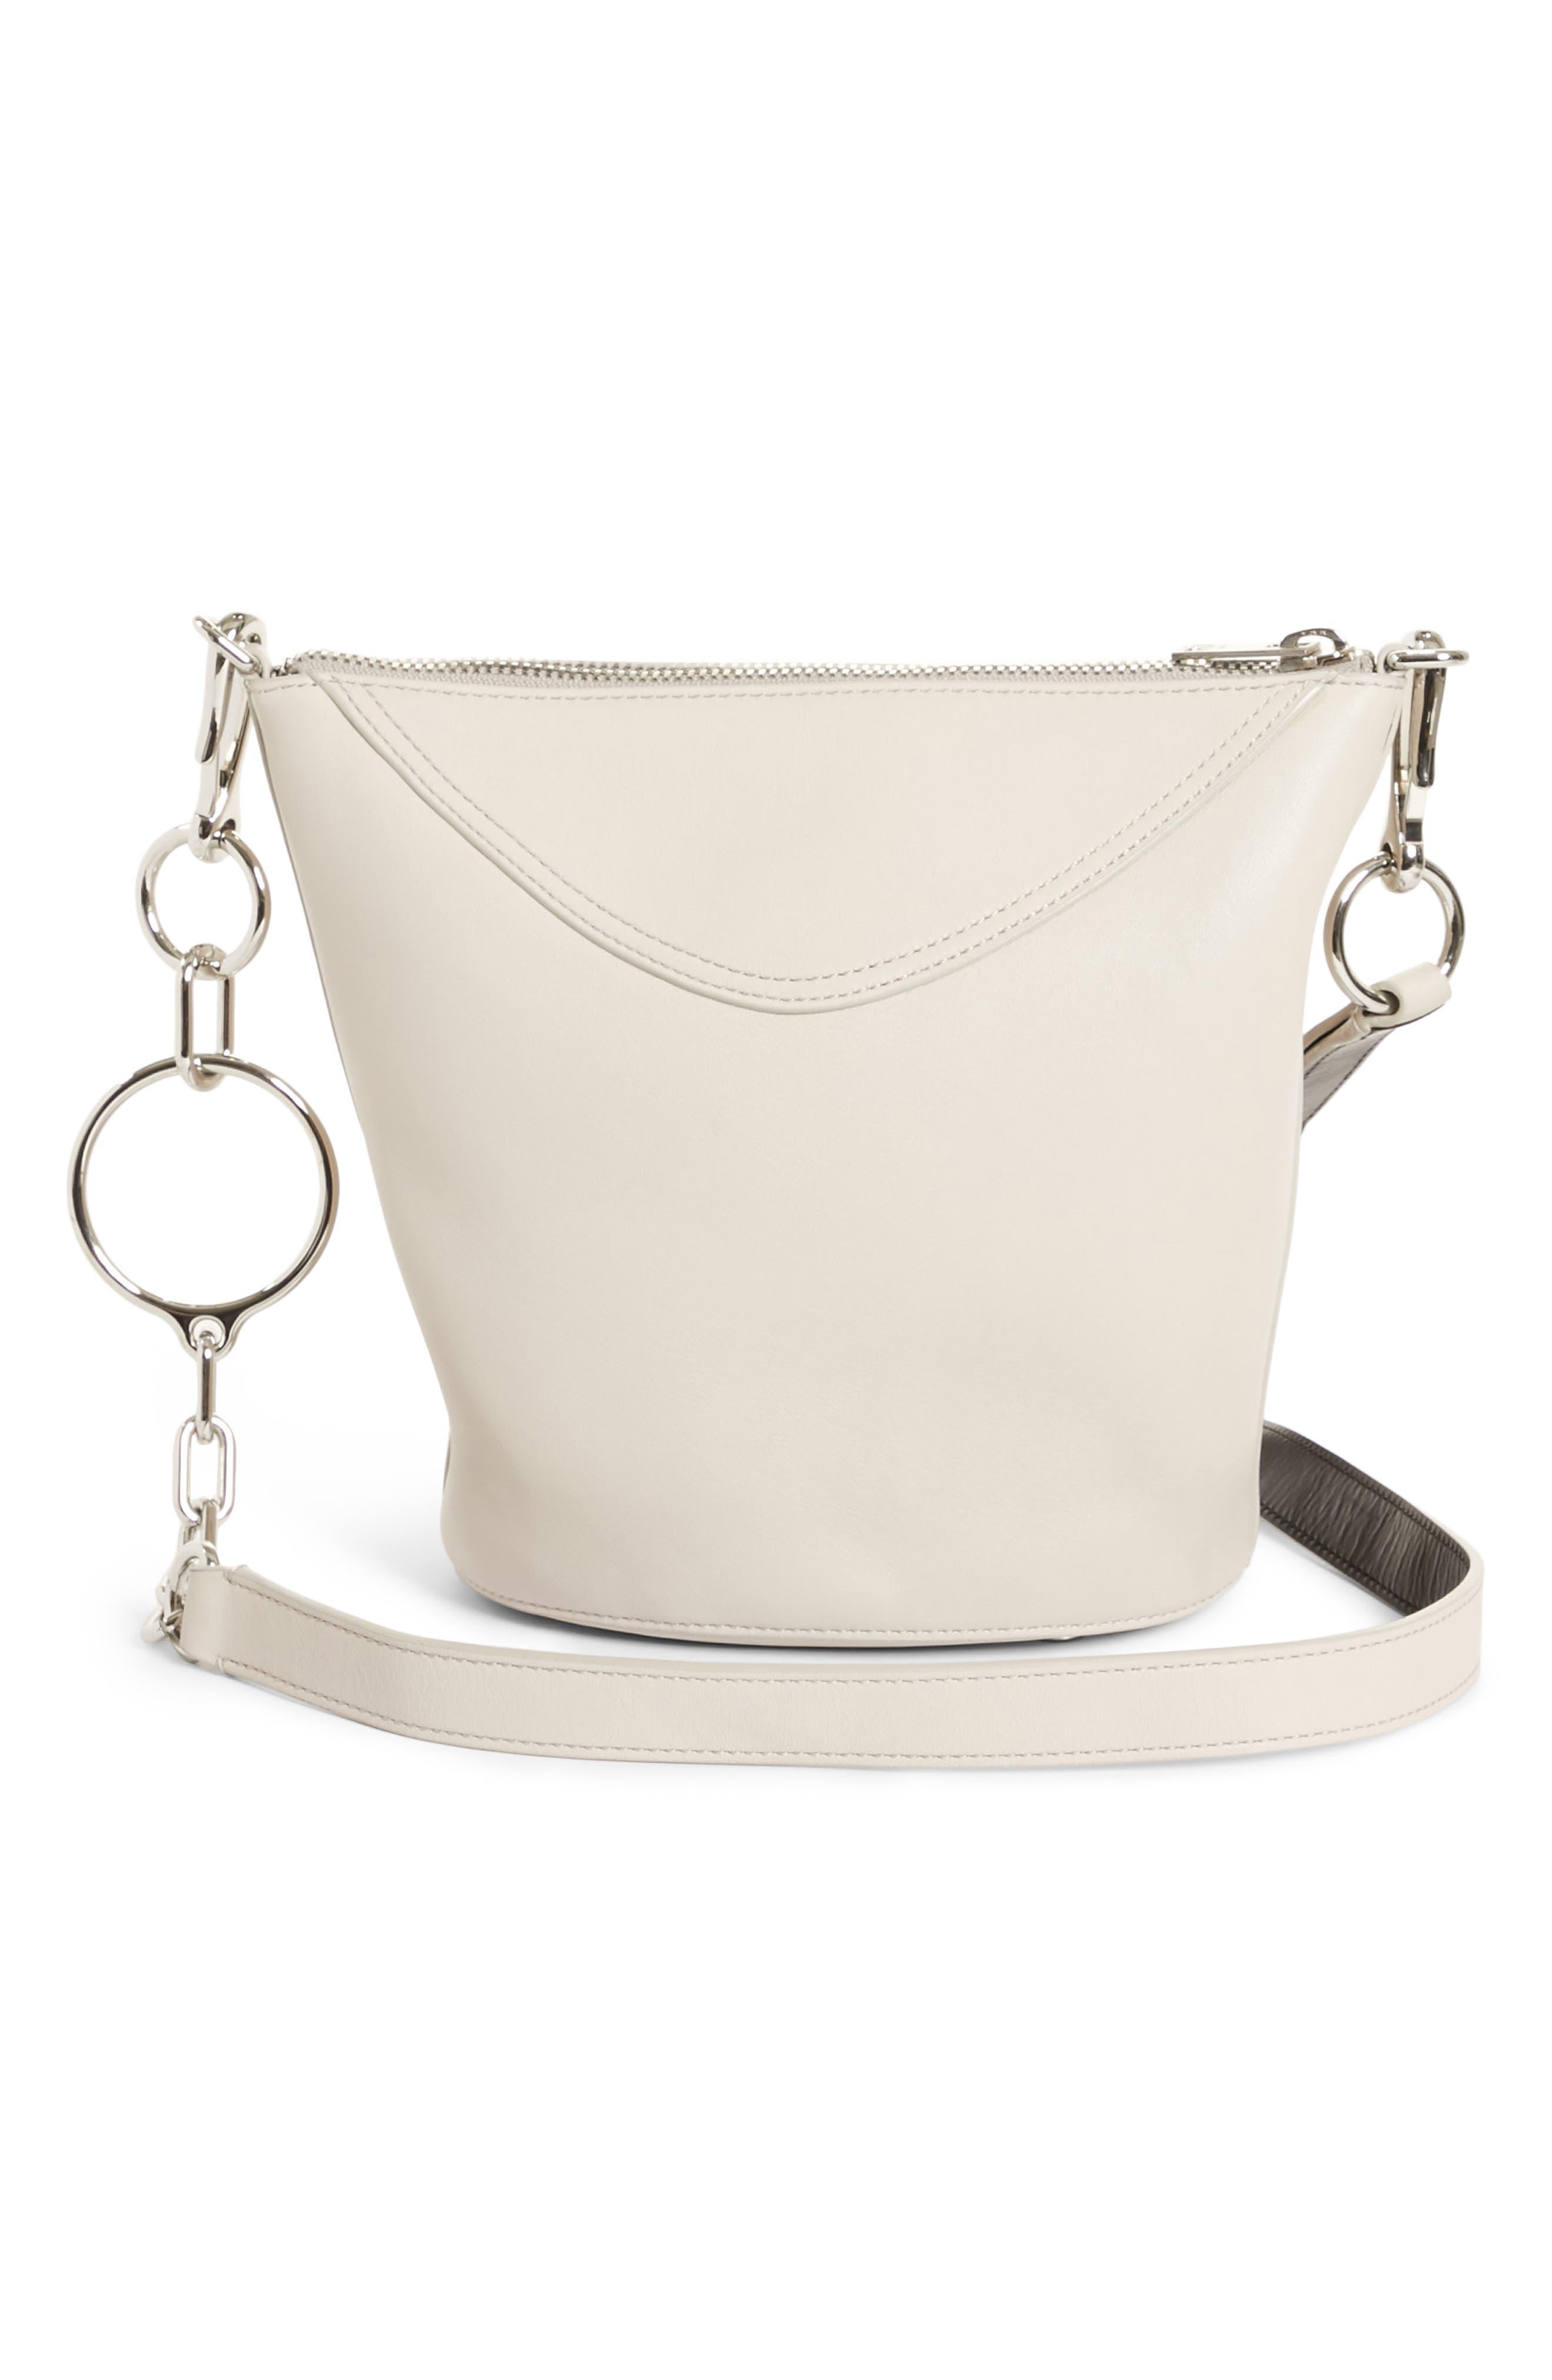 Alternate Image 1 Selected - Alexander Wang Ace Leather Bucket Bag